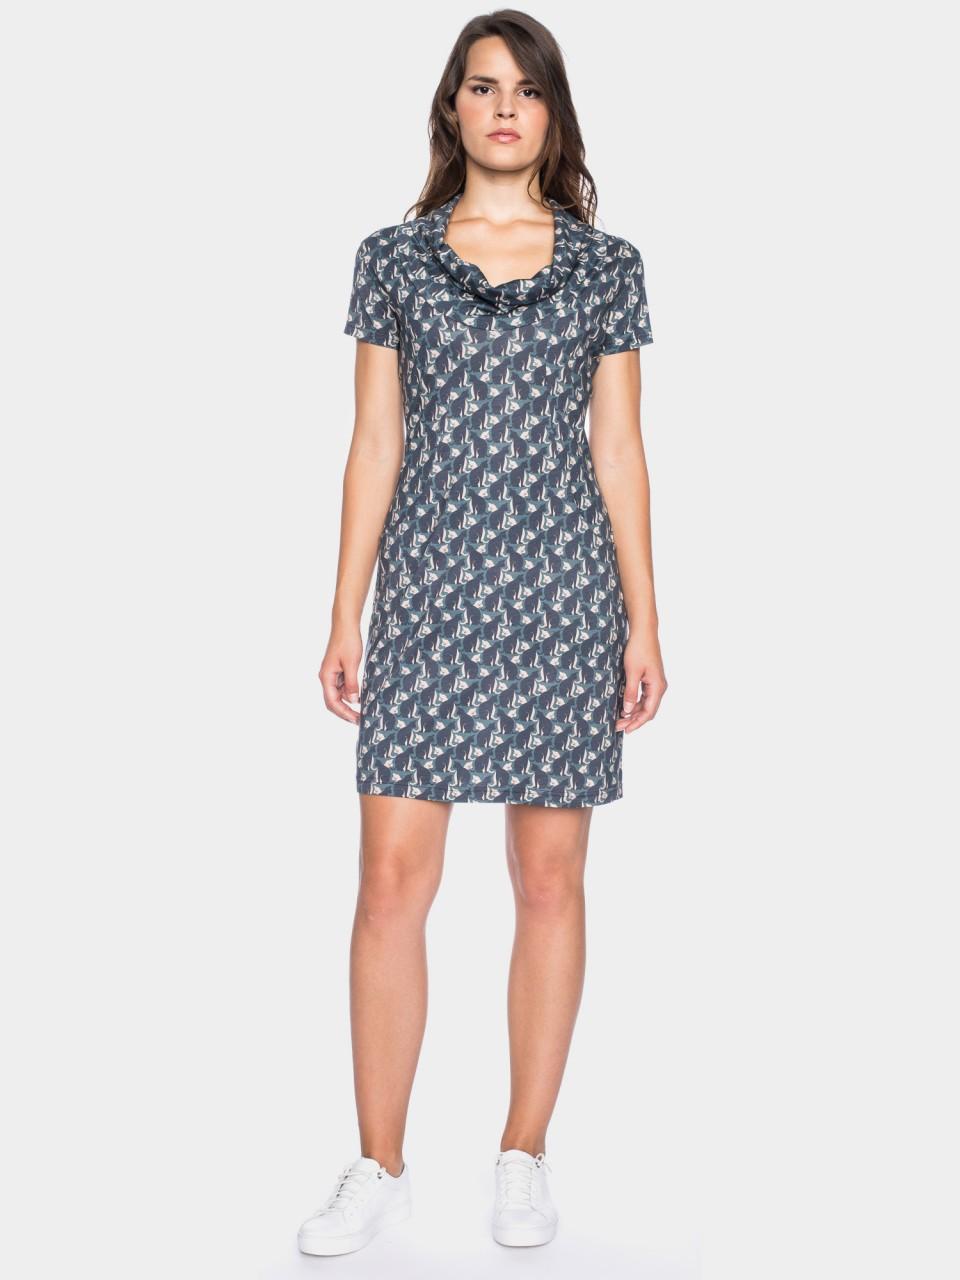 Kleid Erbse CLY/CO 14/027 BL/GR